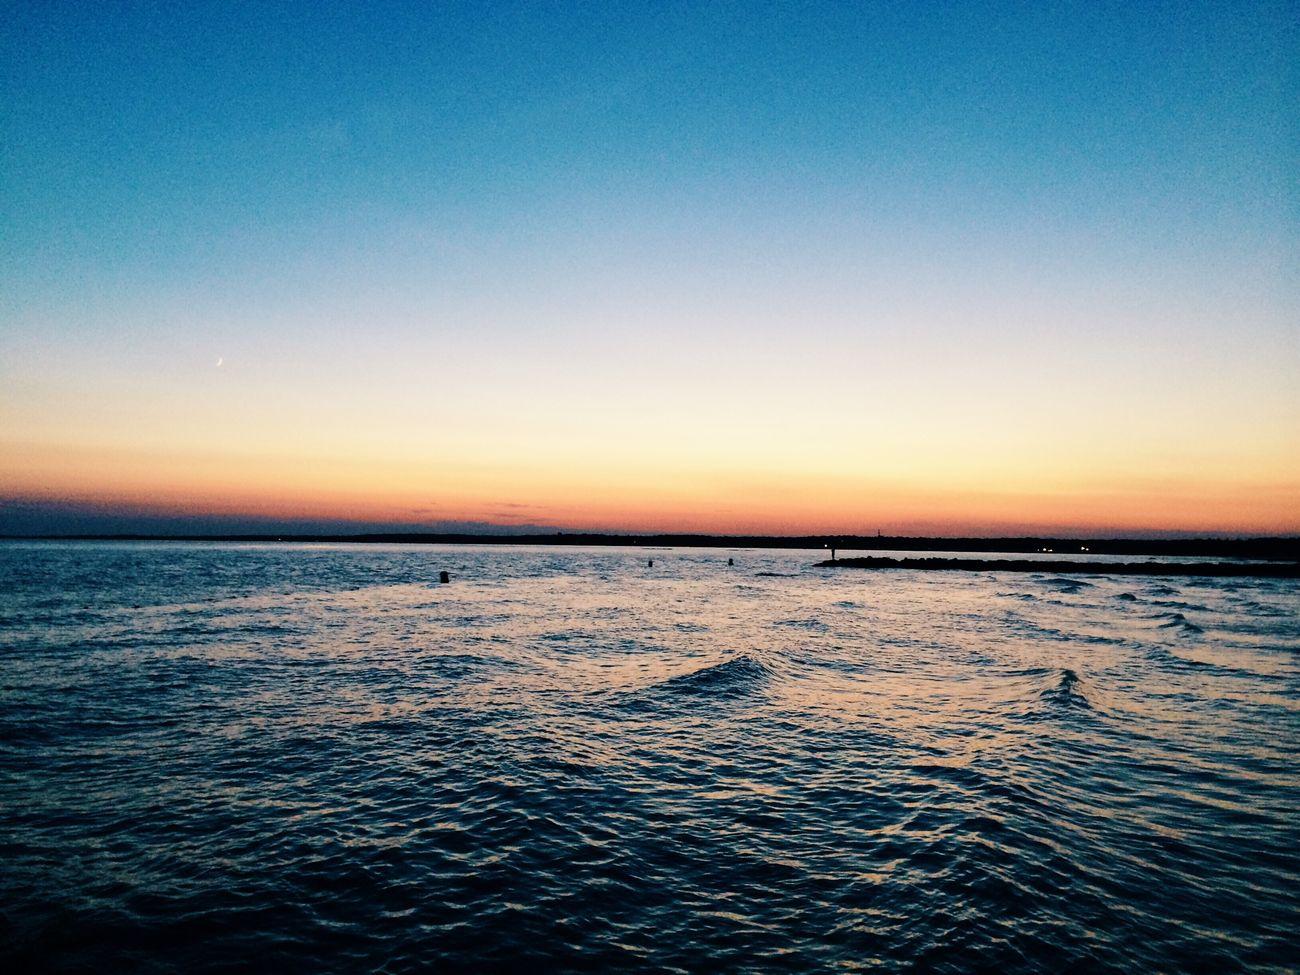 Sunset Silhouettes First Eyeem Photo